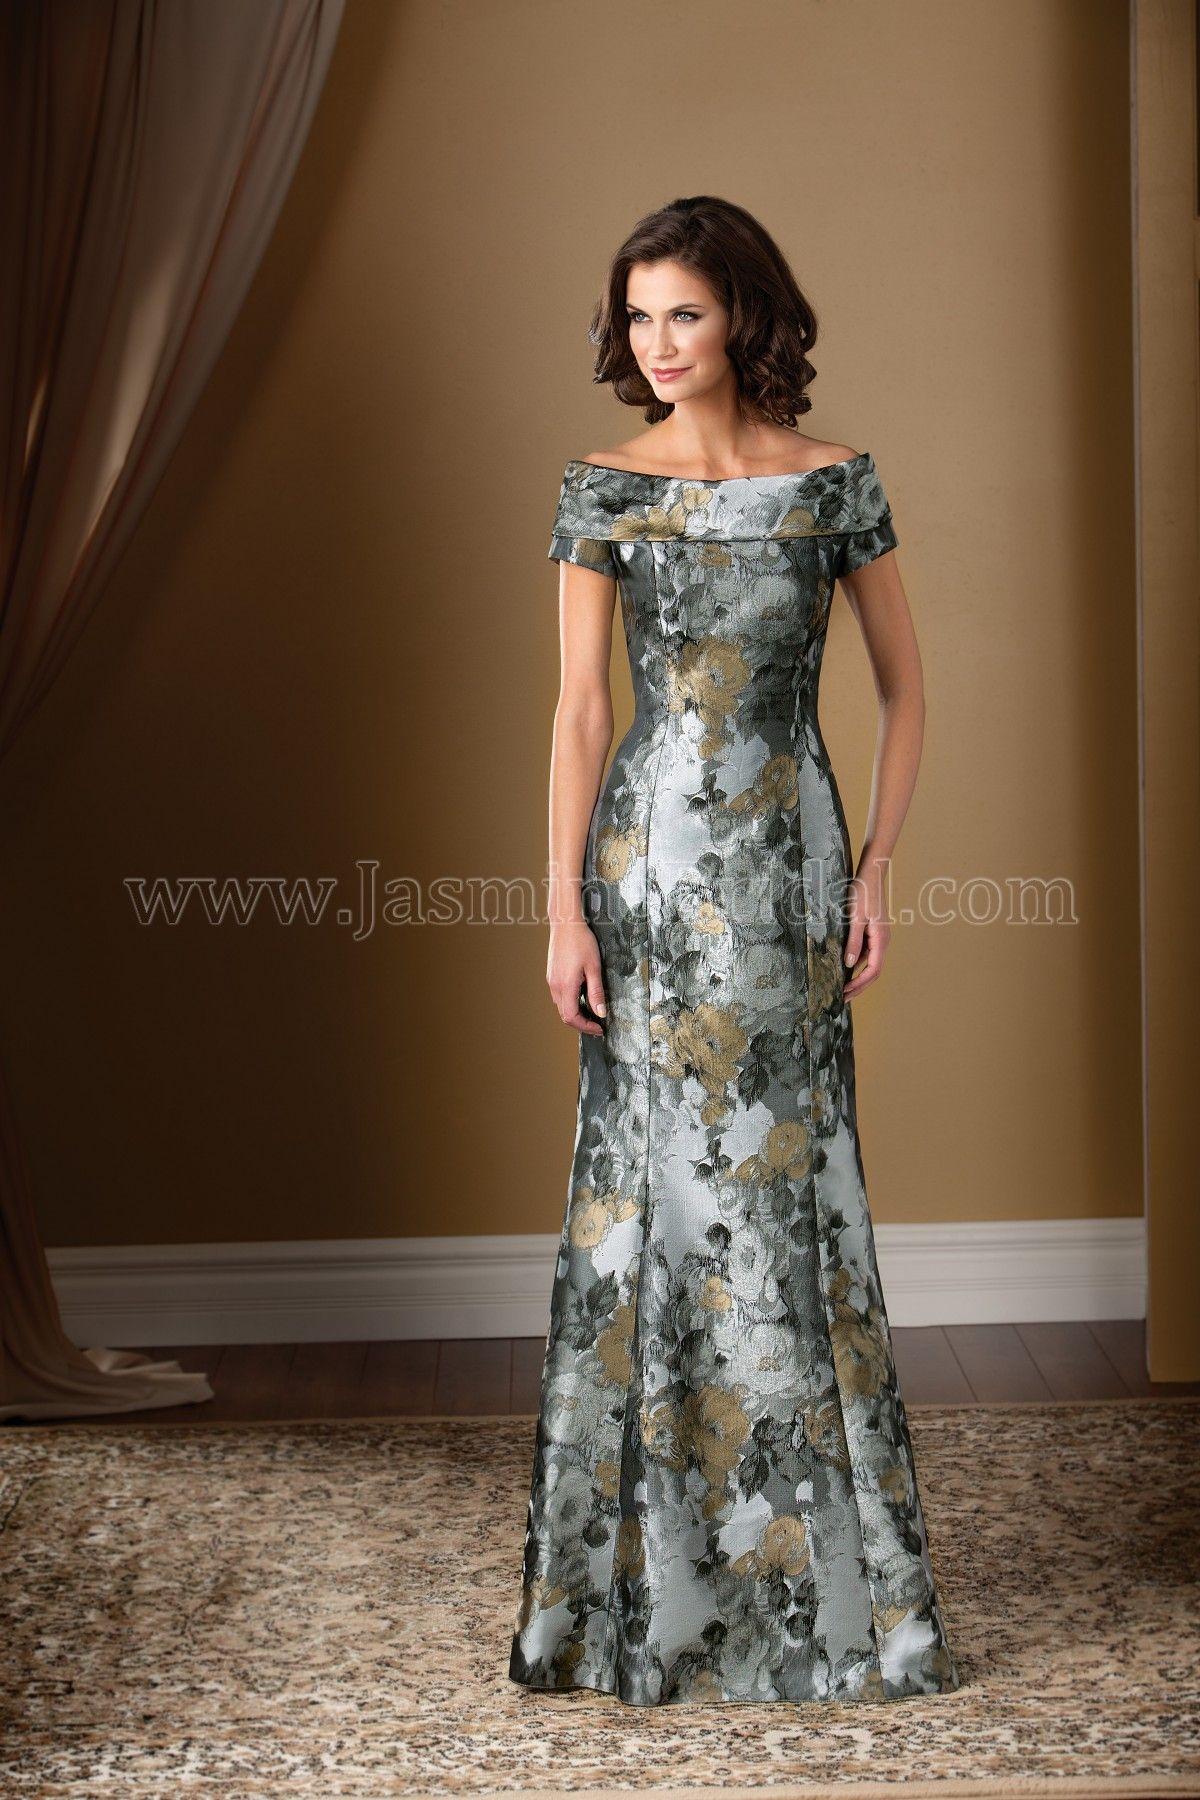 Jasmine Bridal Mother Of The Bride Groom Dress Jade